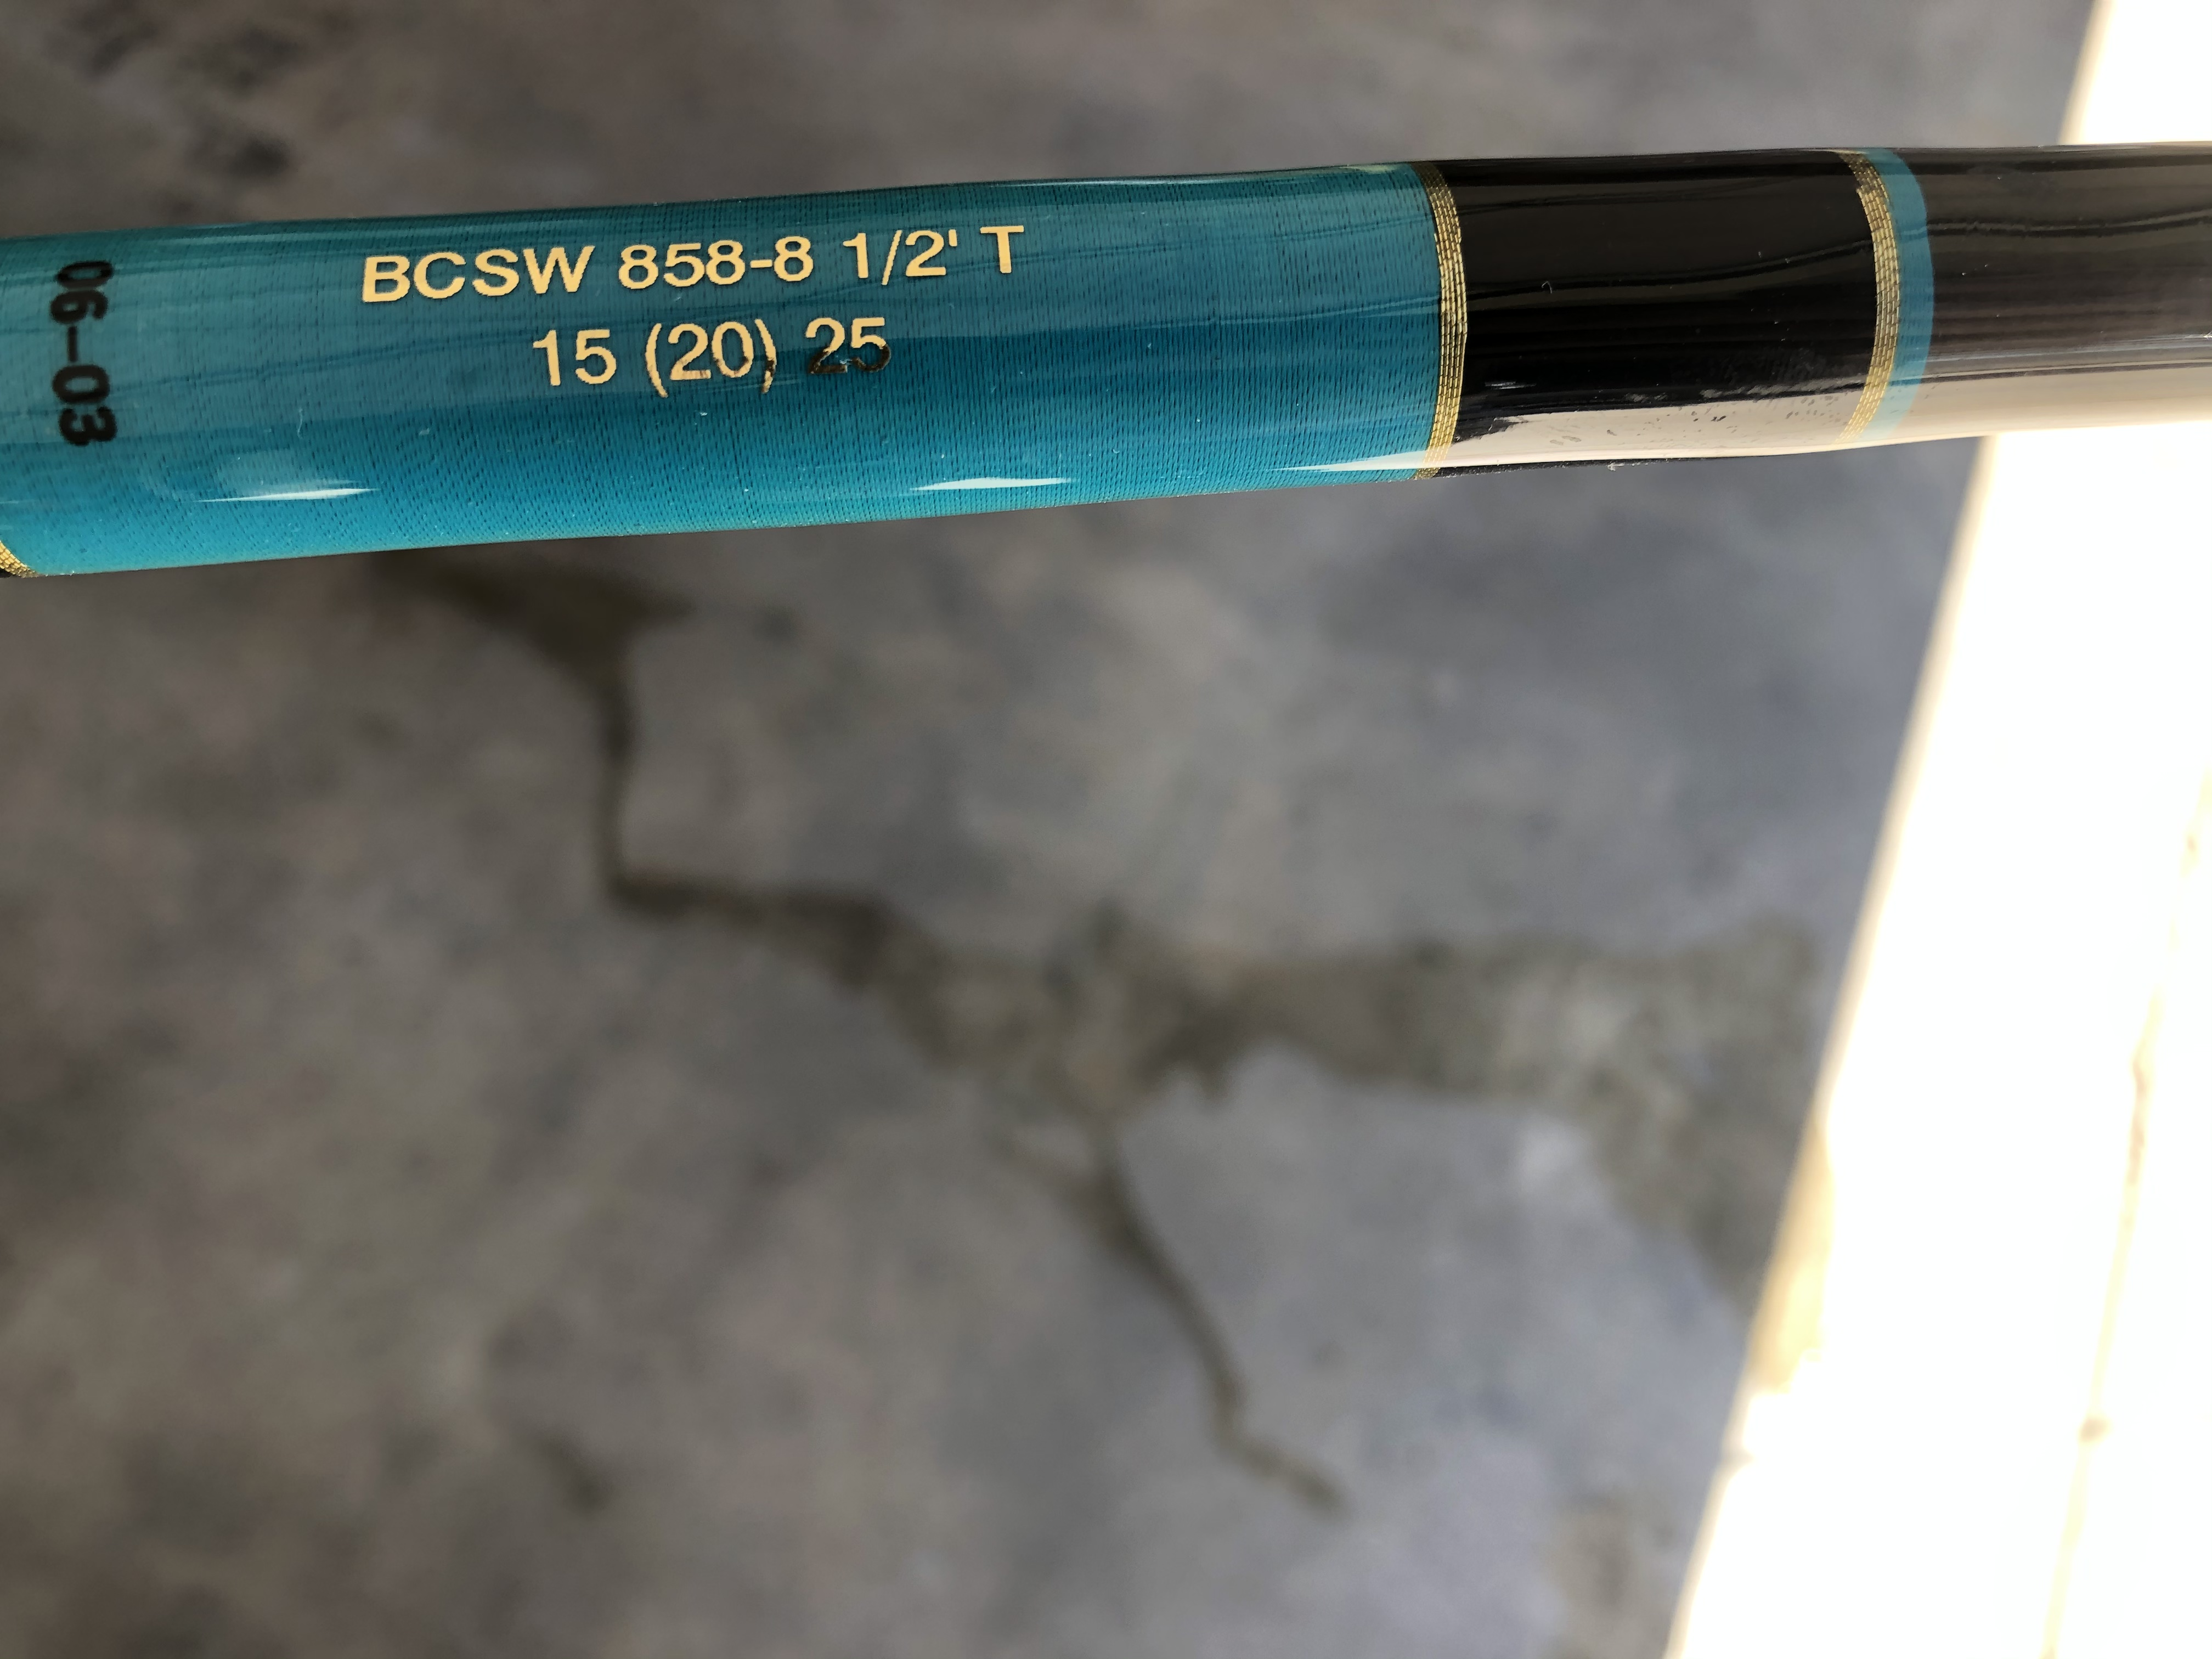 5F6D75B7-9087-468E-89CC-BACB10D7F15A.jpeg